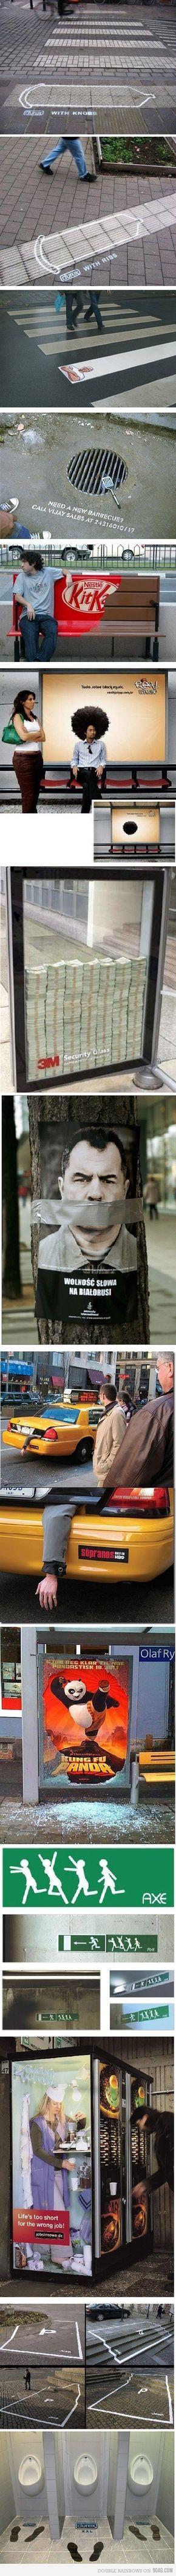 Just some guerrilla marketing. ;)